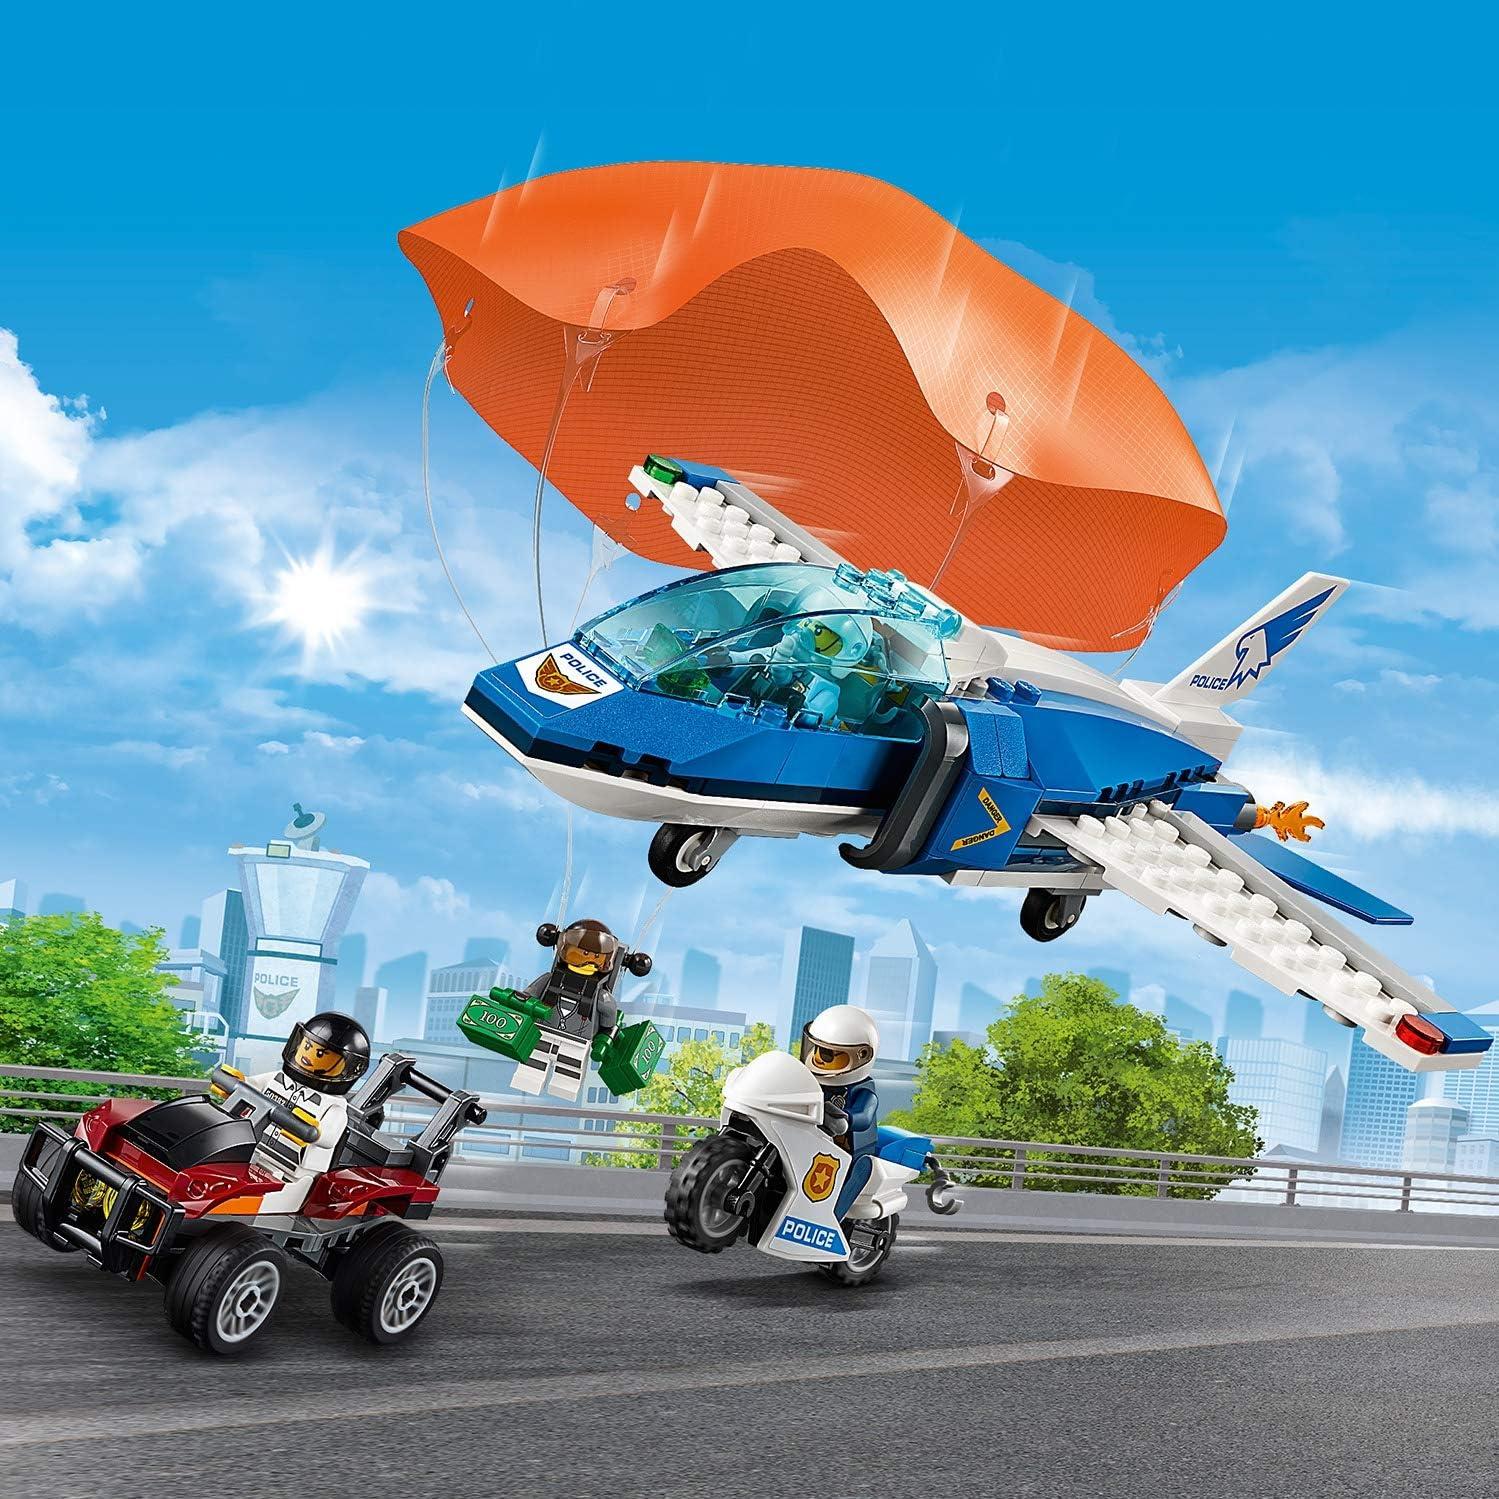 LEGO City Police Sky Police Parachute Arrest Playset, Toy Jet & Buggy Car, Police Toys for Kids